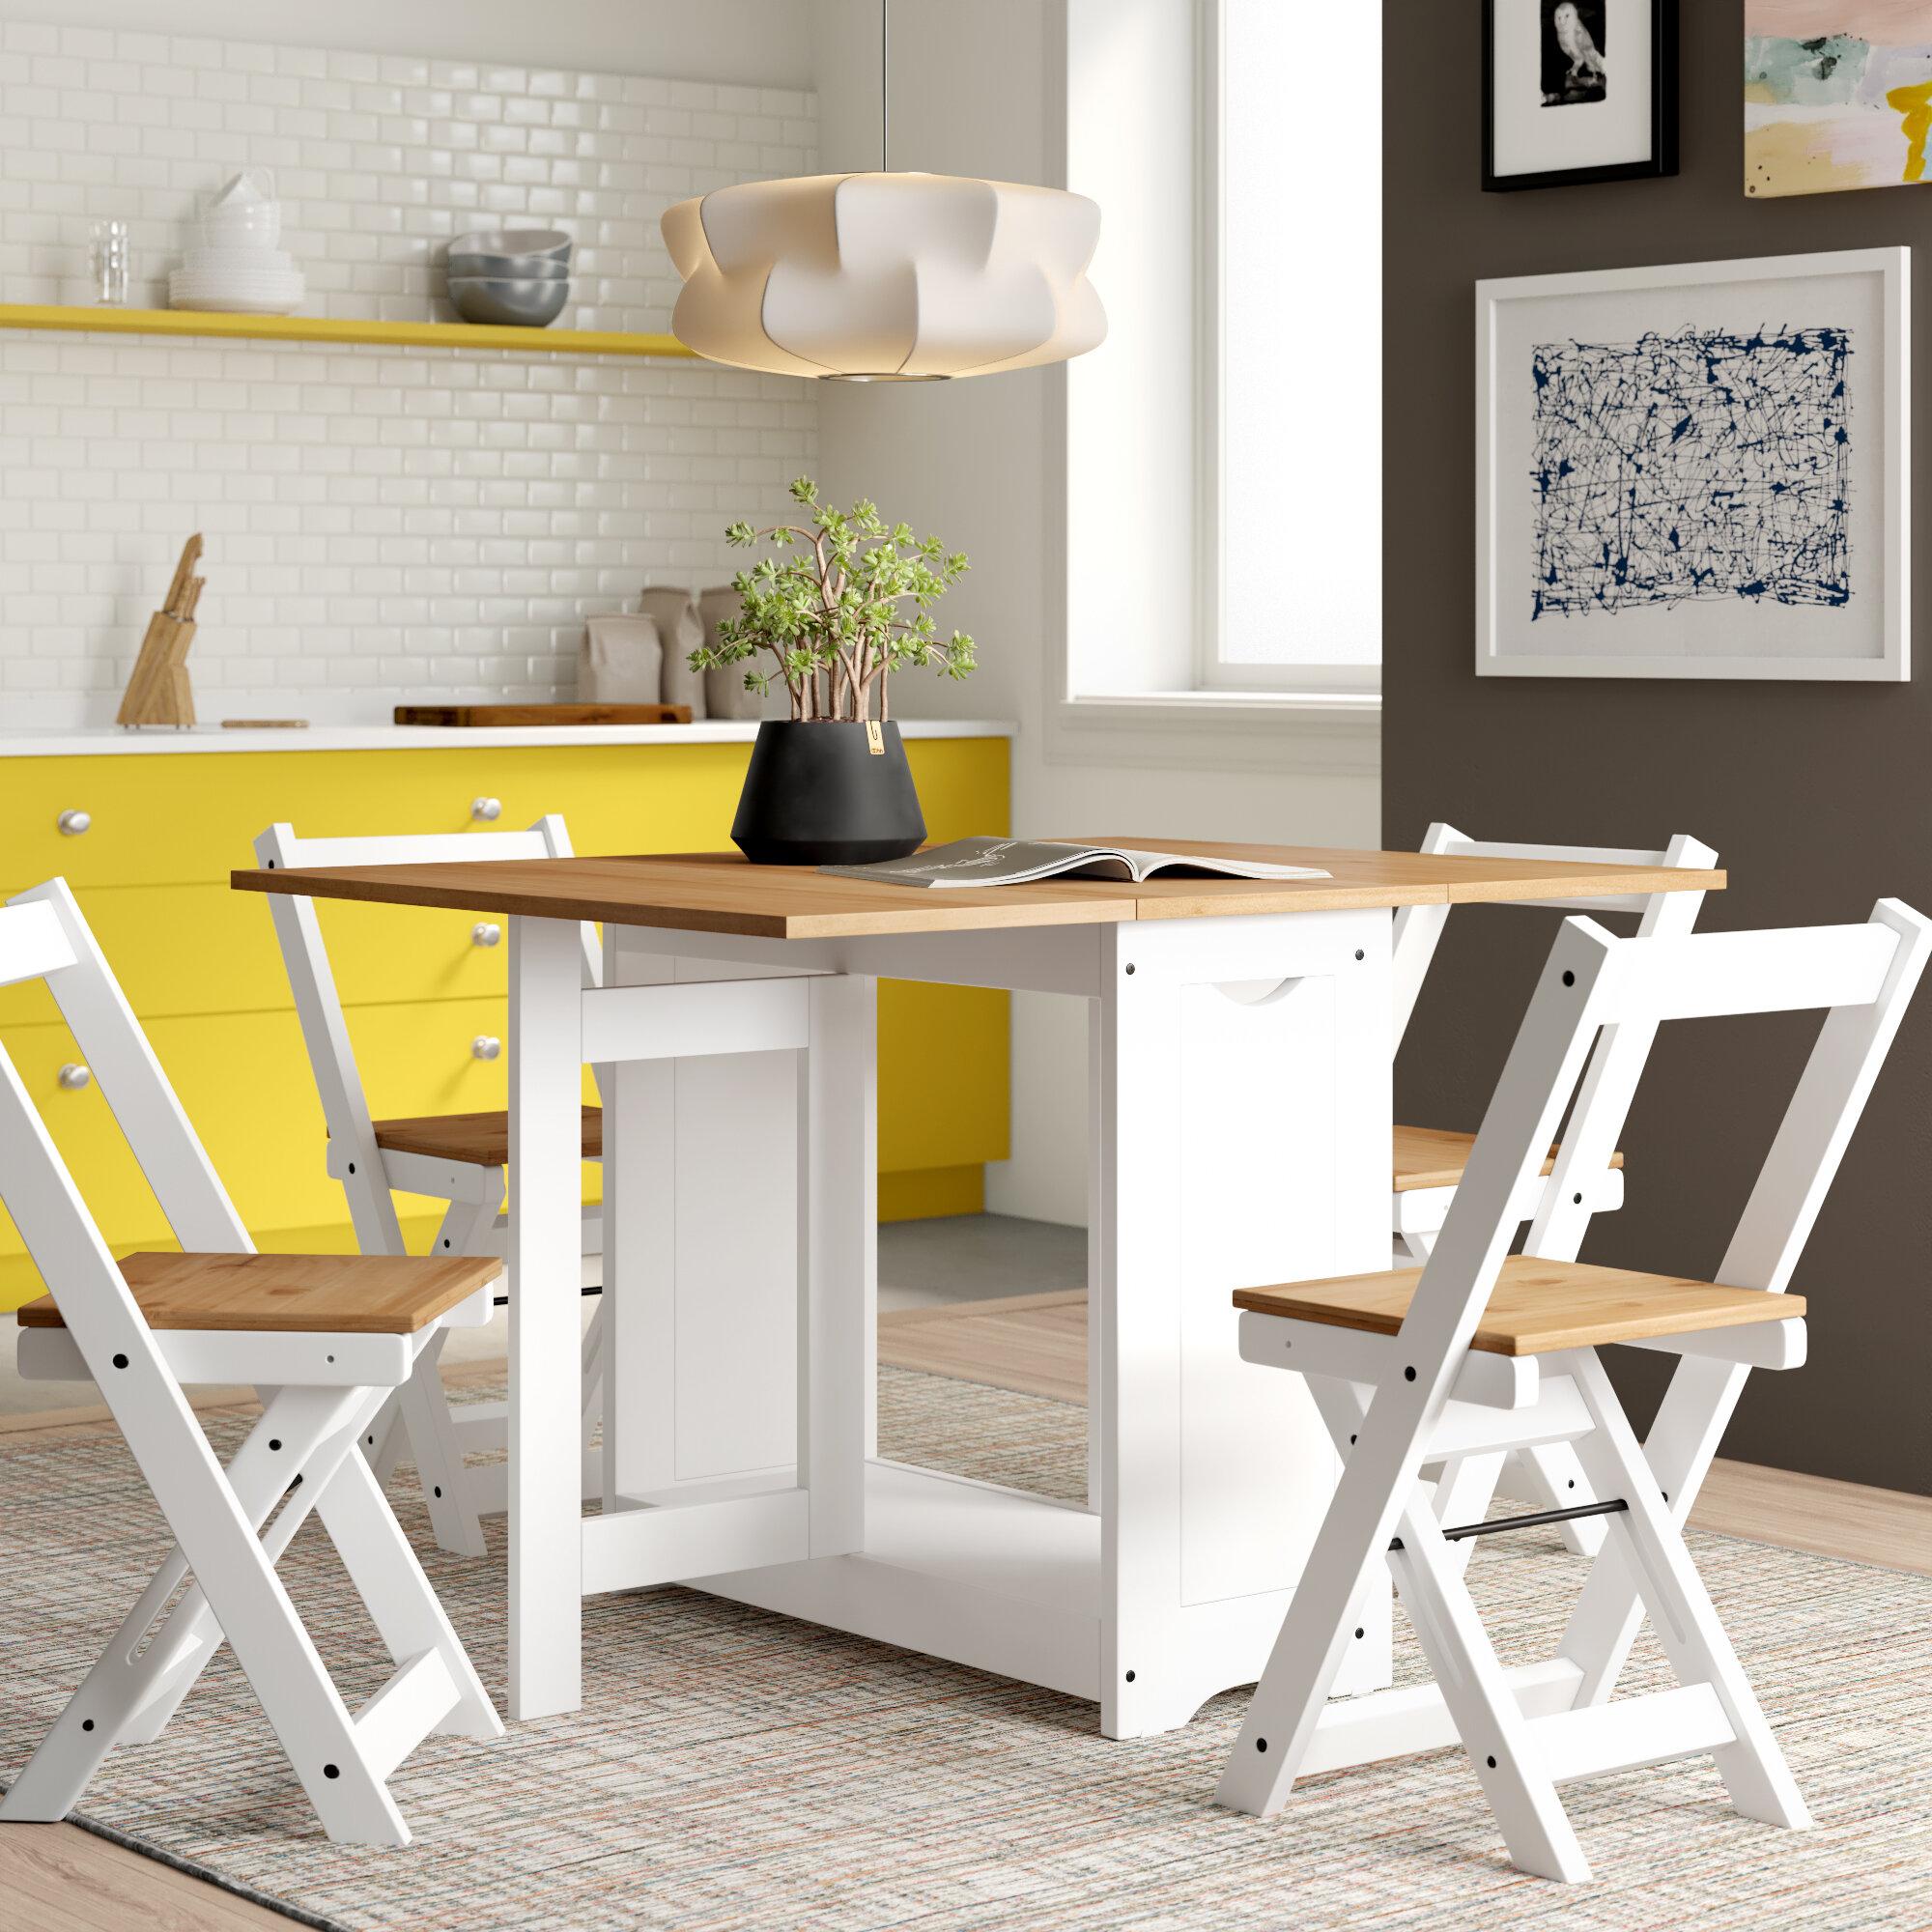 Buy Folding dining Table Set Online| 4